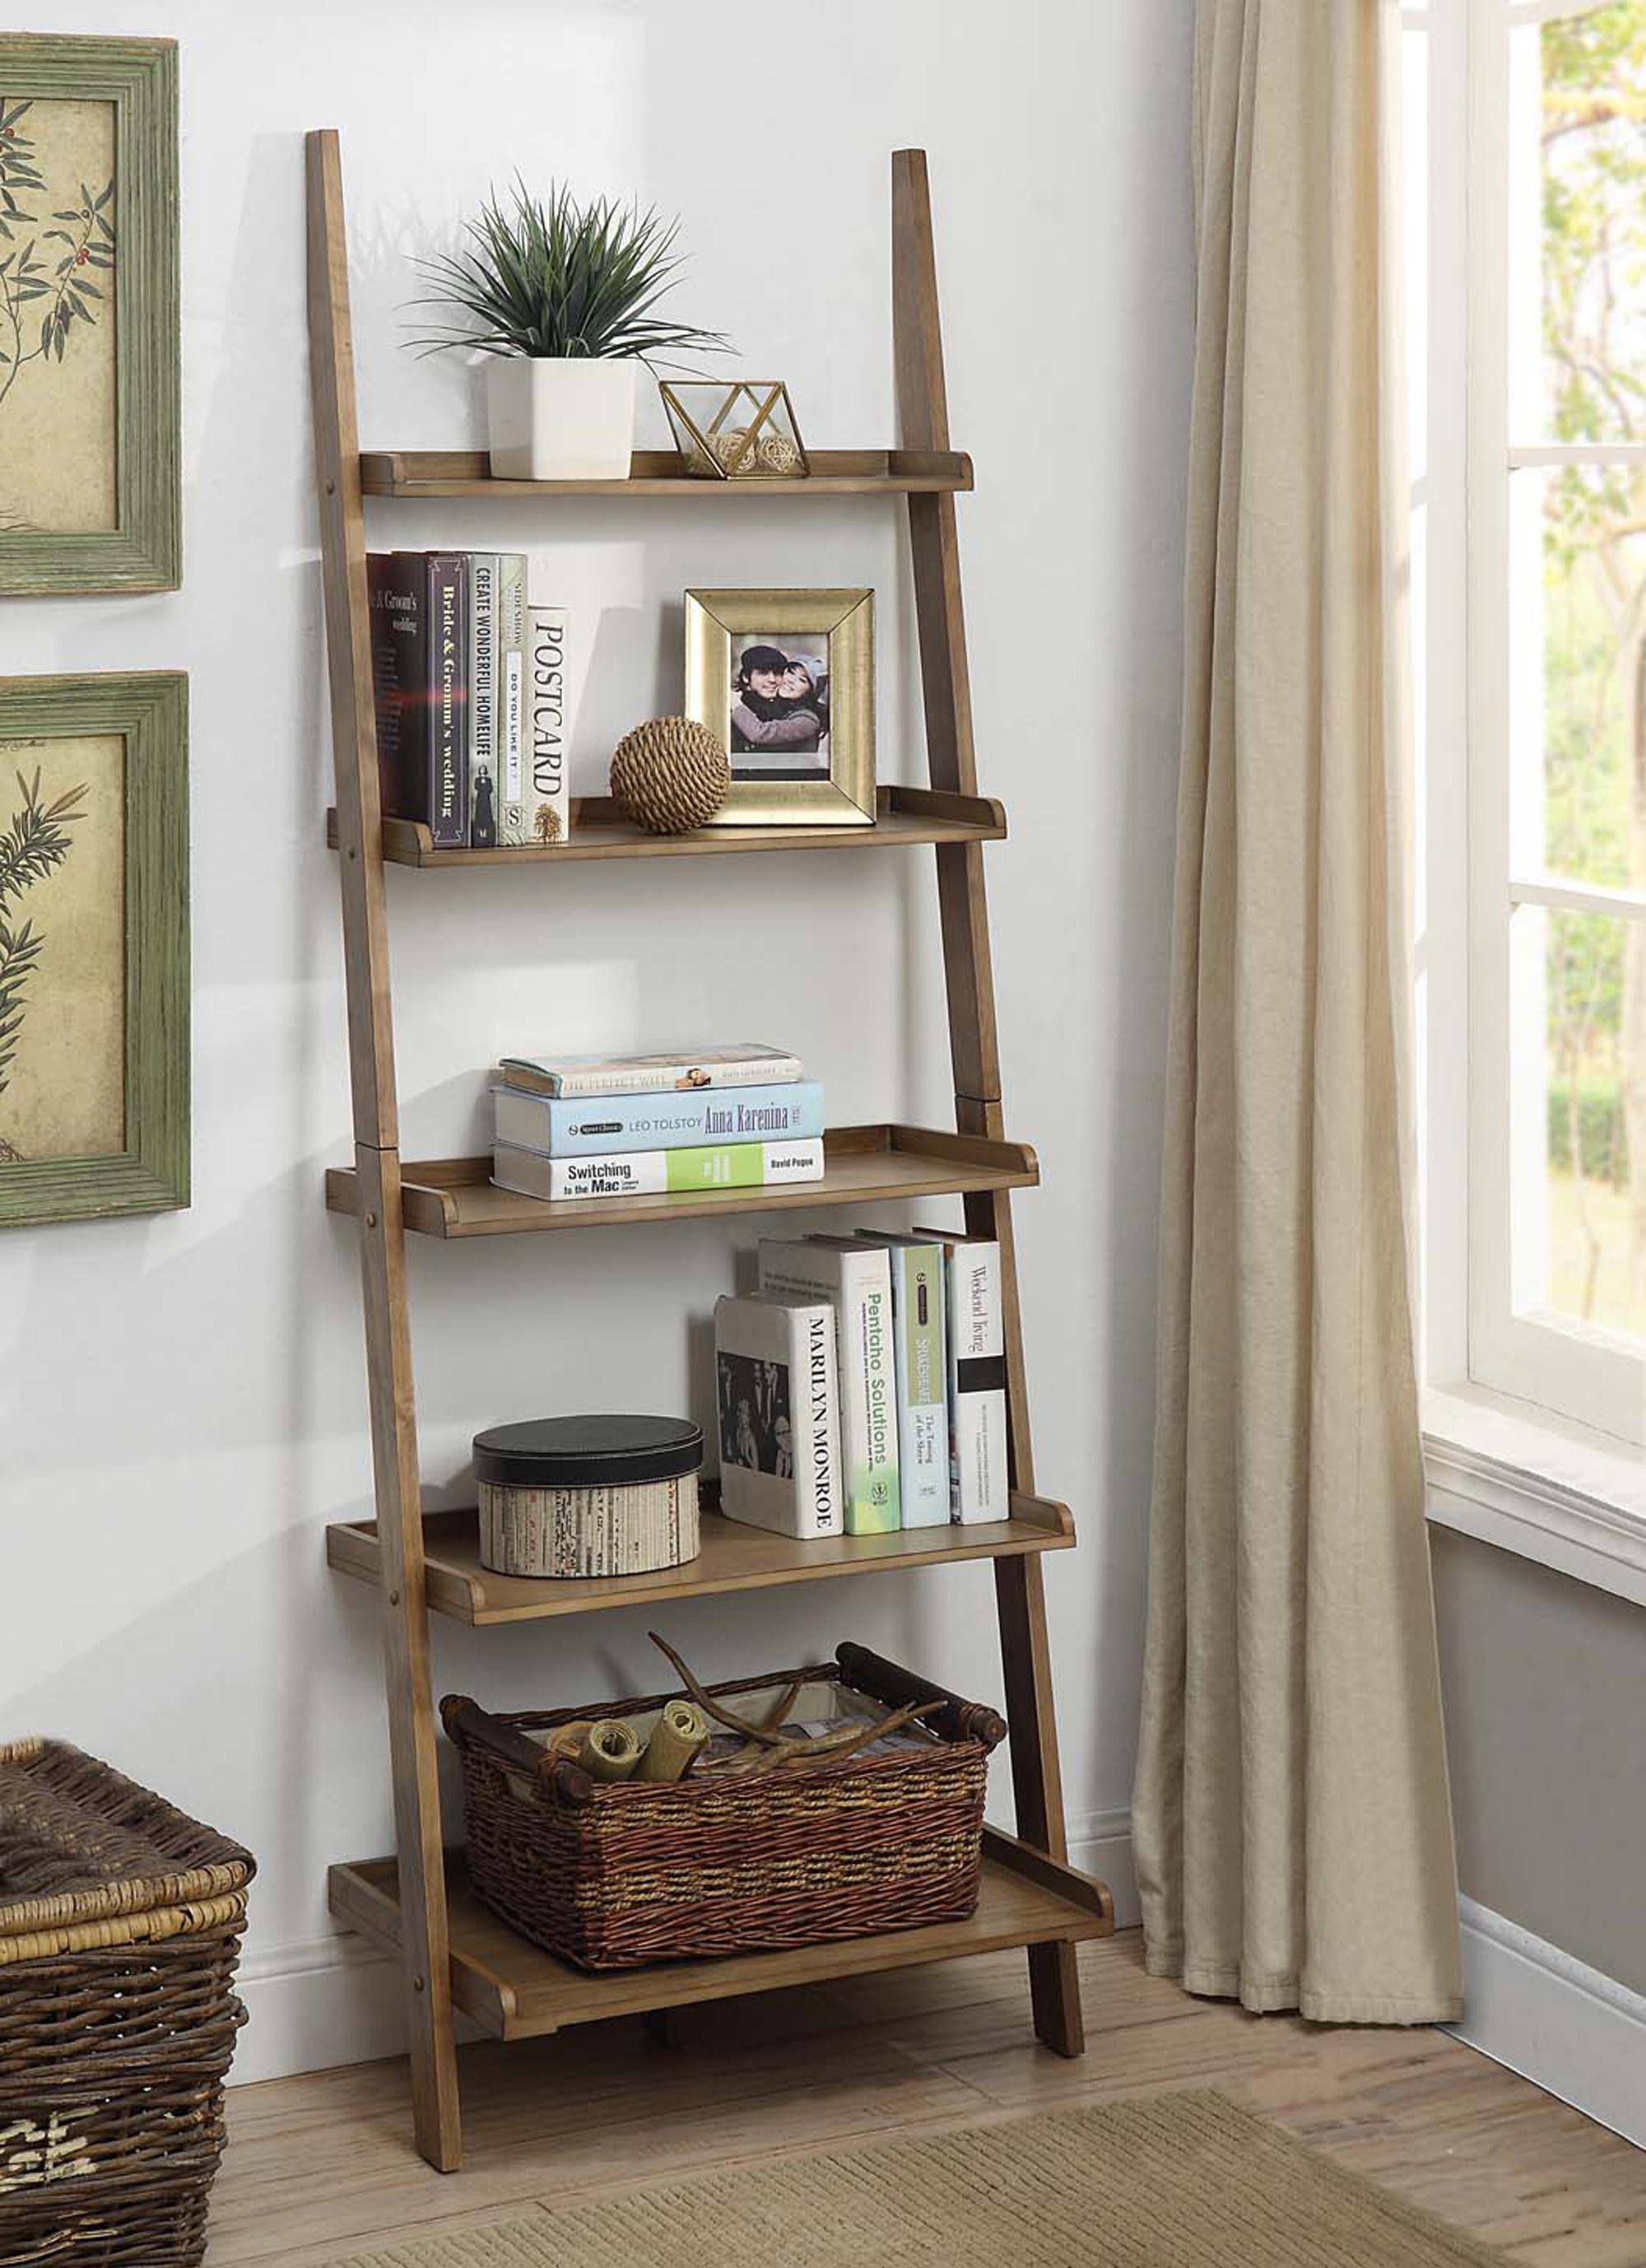 A five tier leaning bookshelf